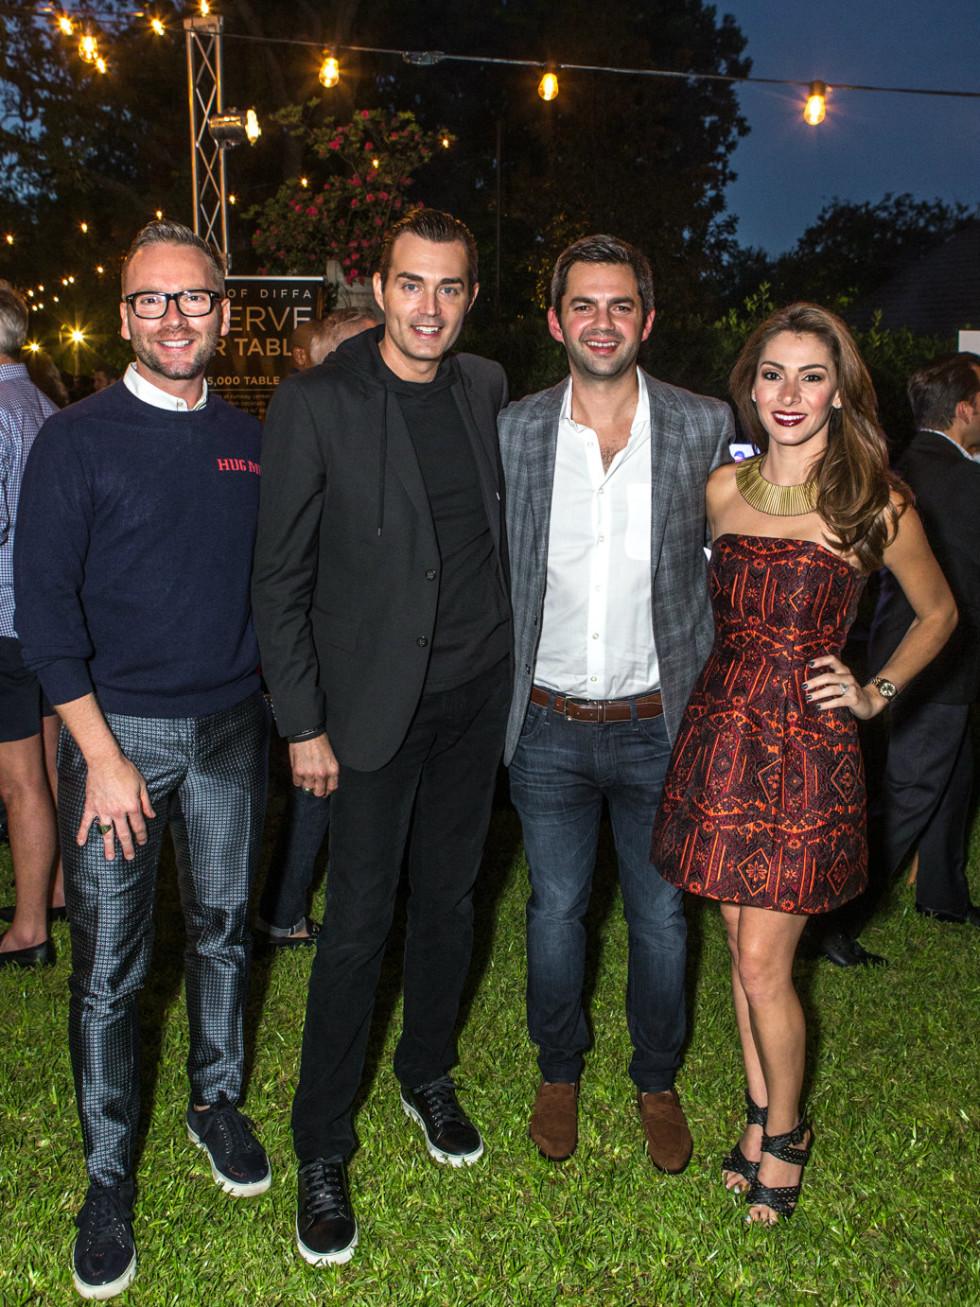 Scott Kehn, Chuck Steelman, Kyle Stein, Jody Stein